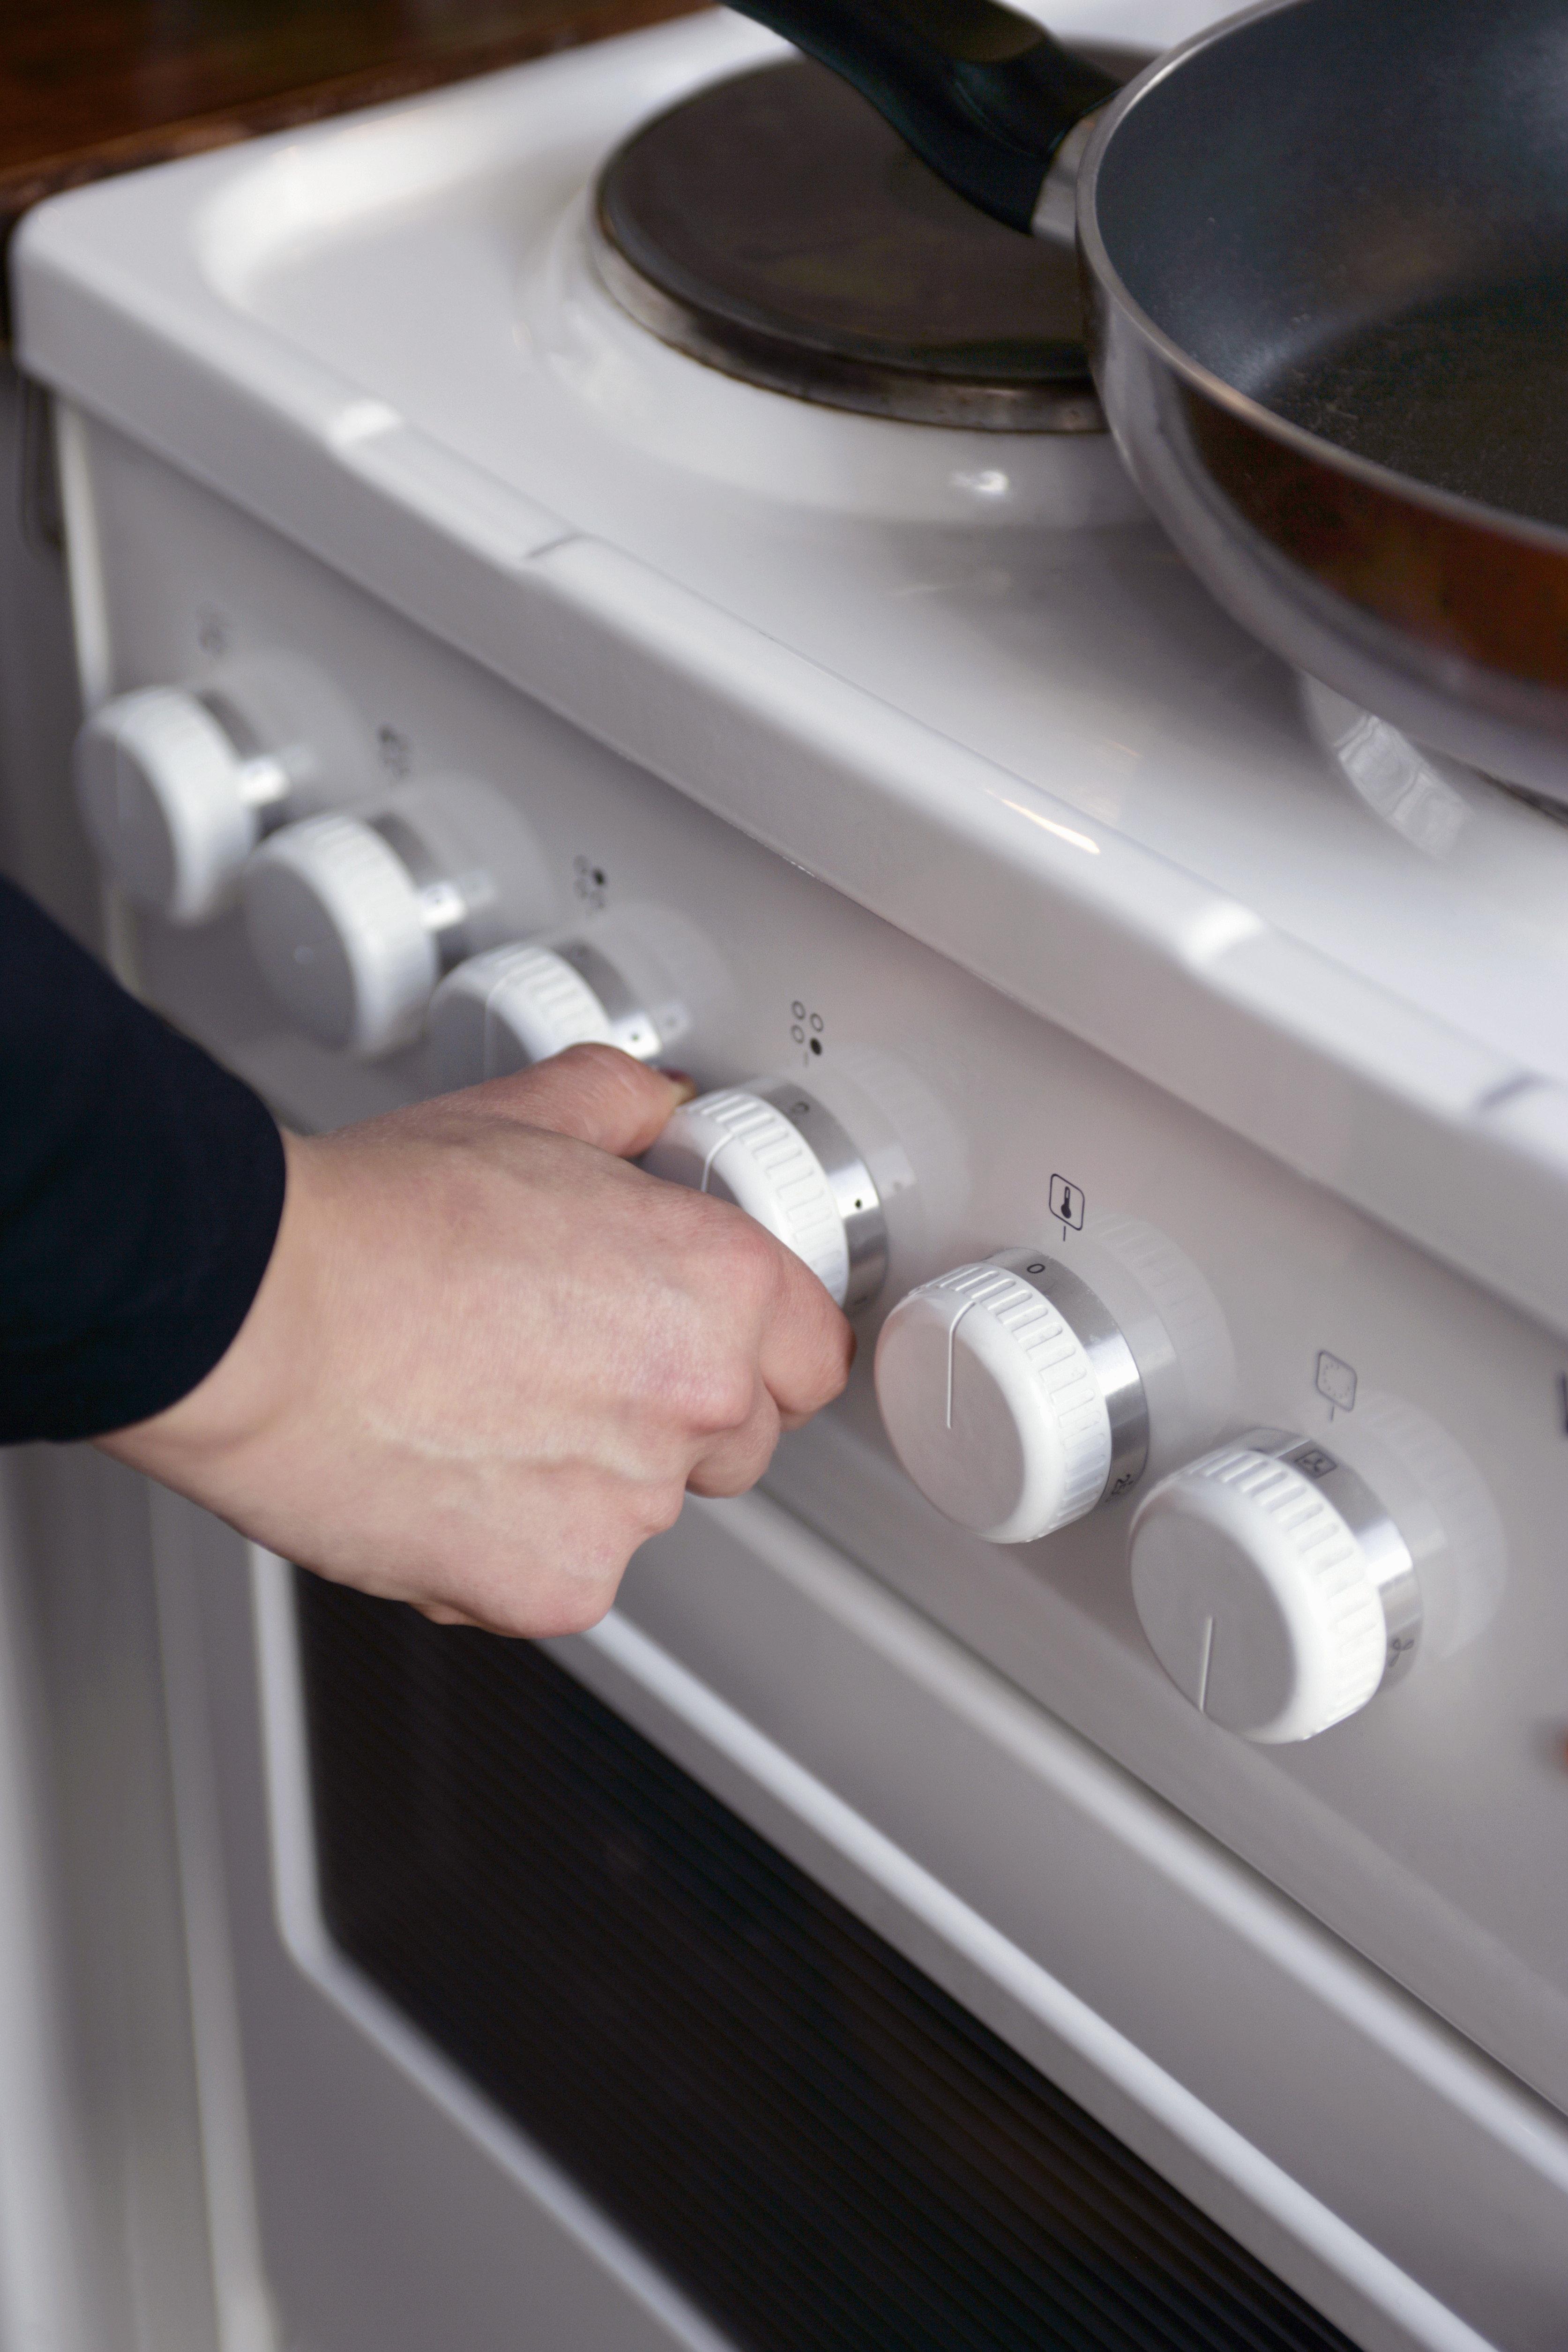 A woman adjusting an stove